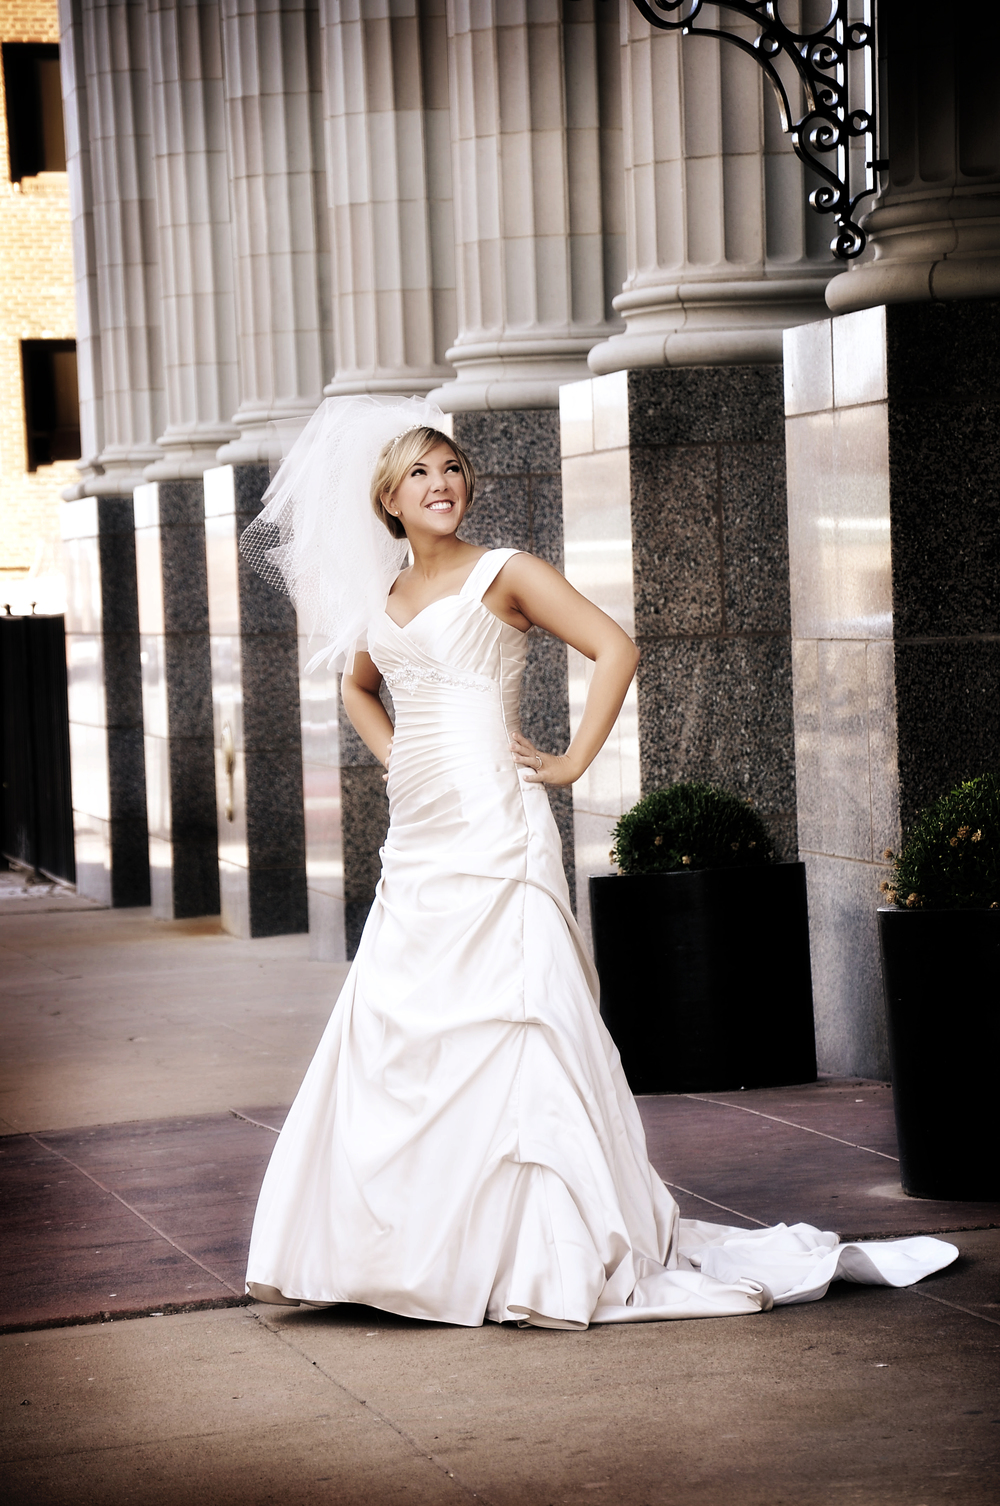 daLizs Bridal Portraits 33.jpg